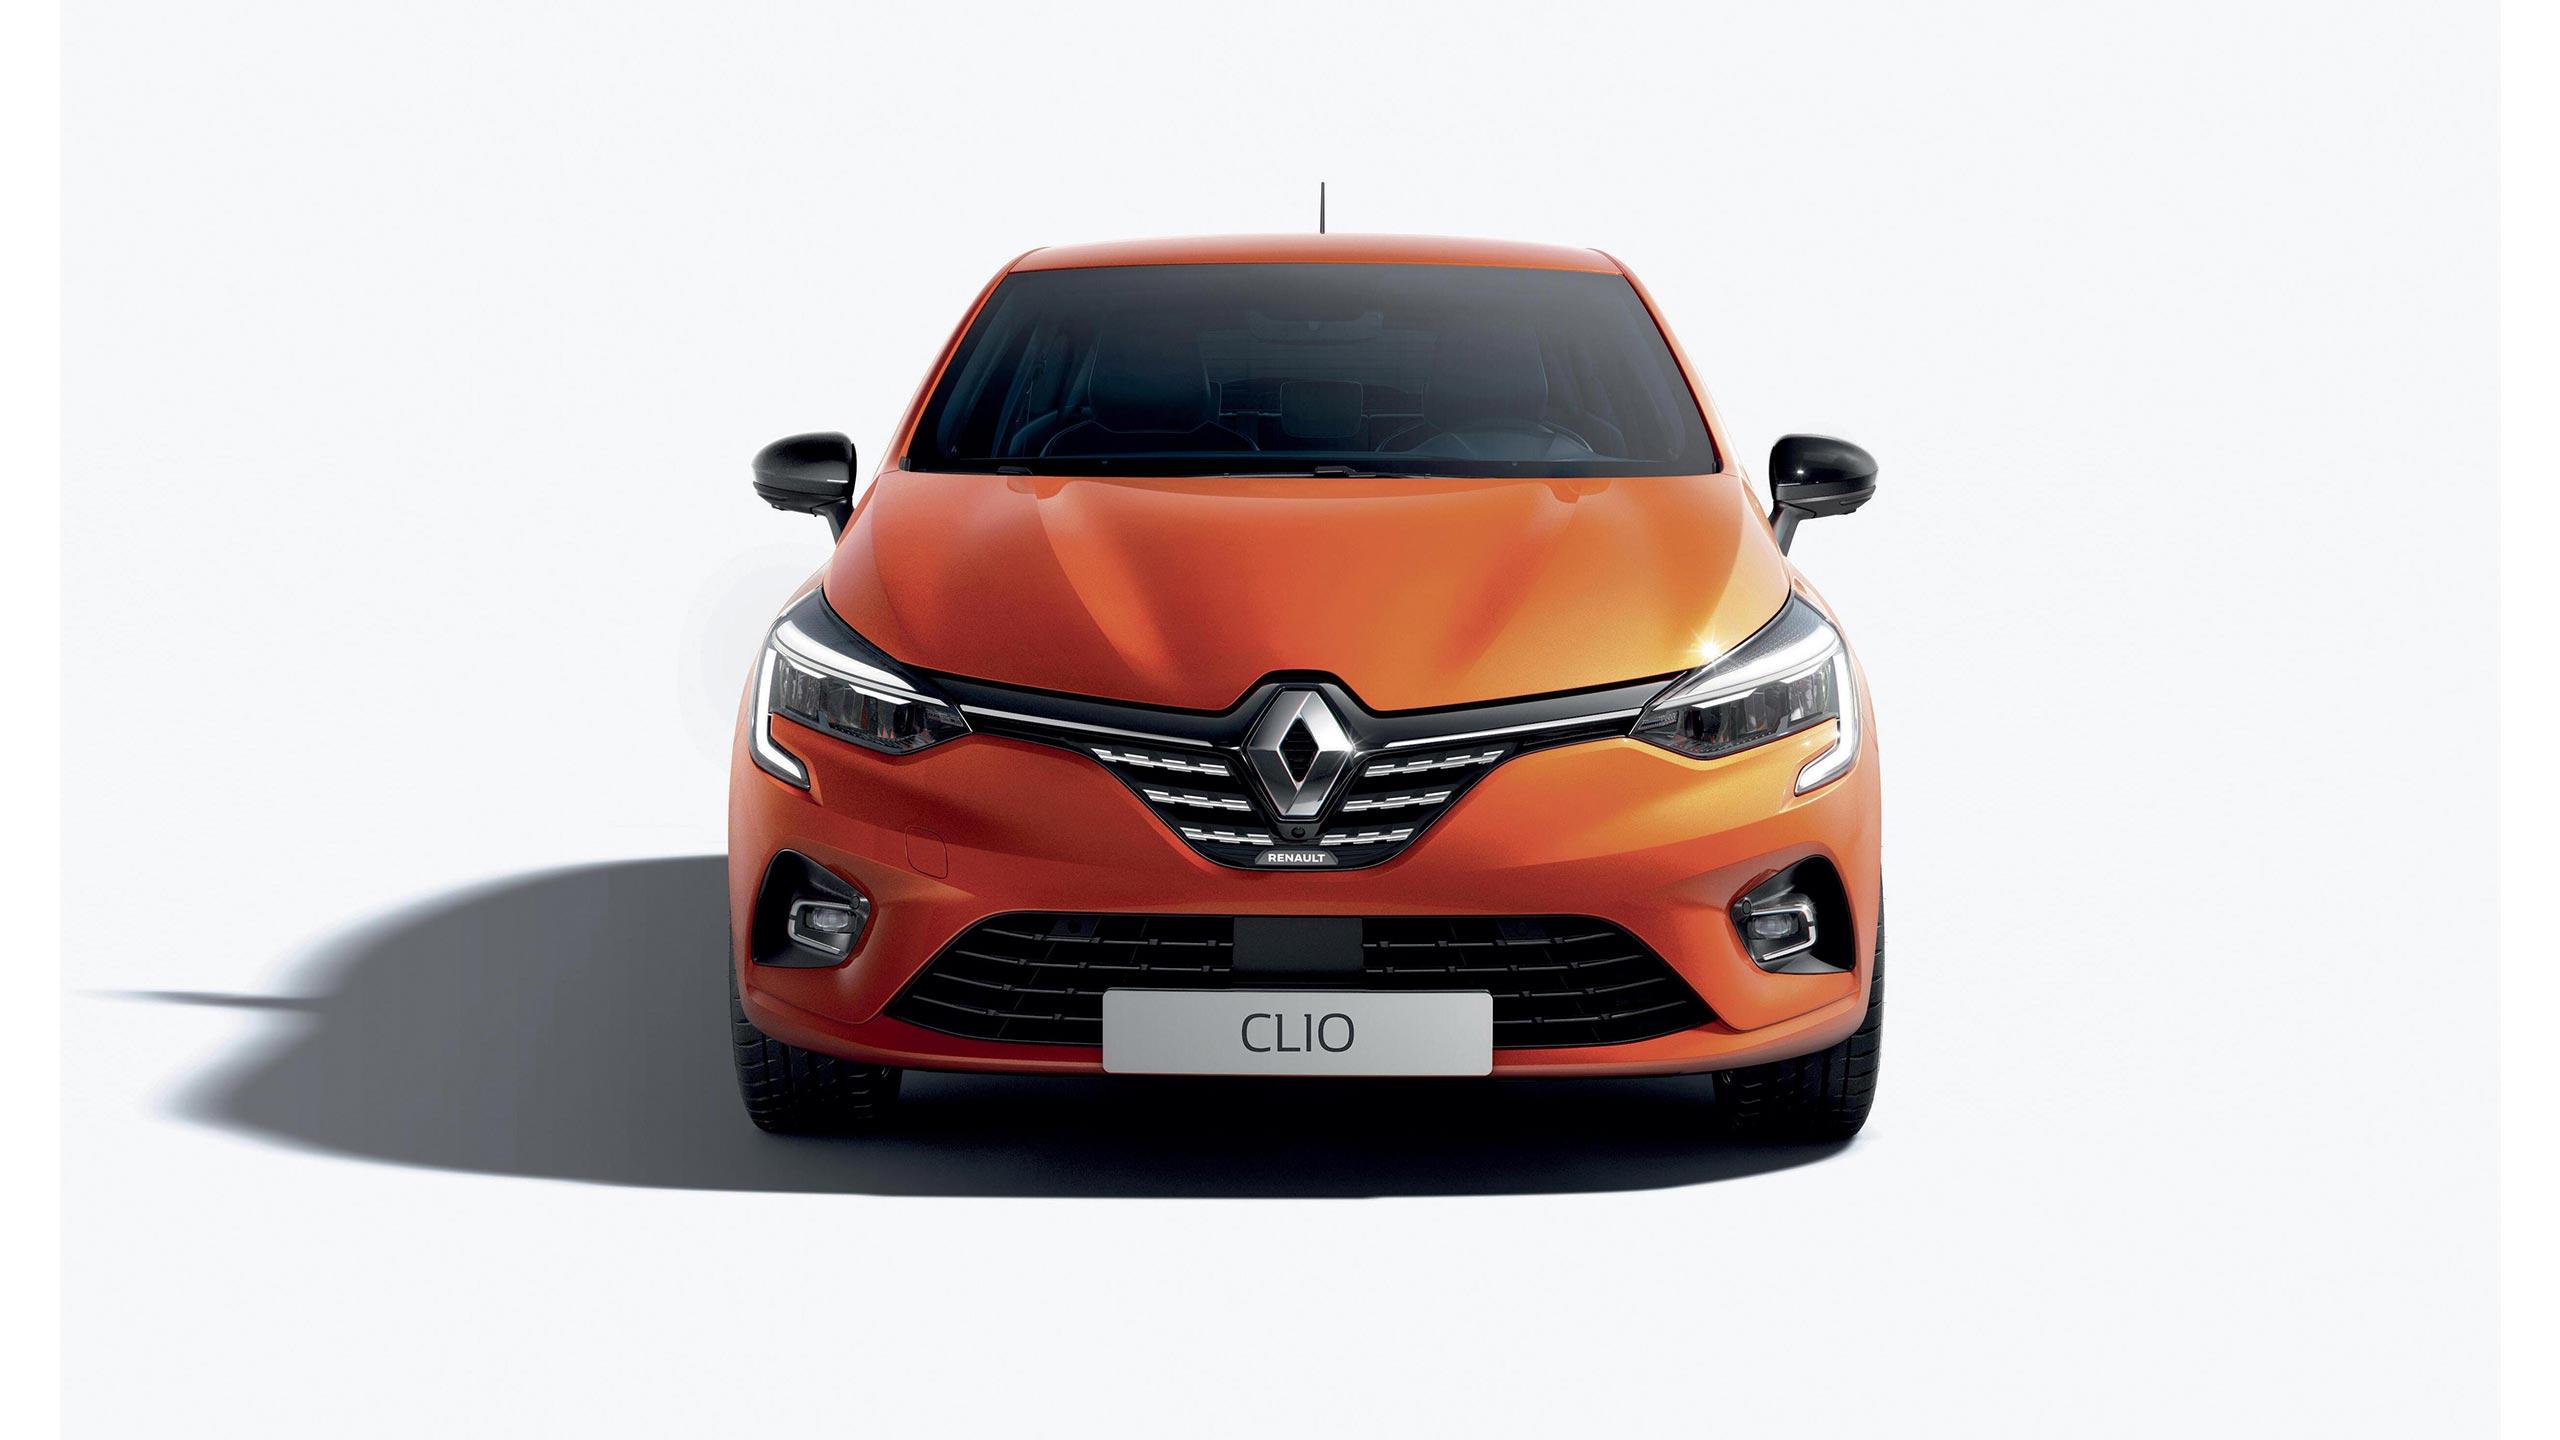 Renault Clio Autozentren P&A-Preckel